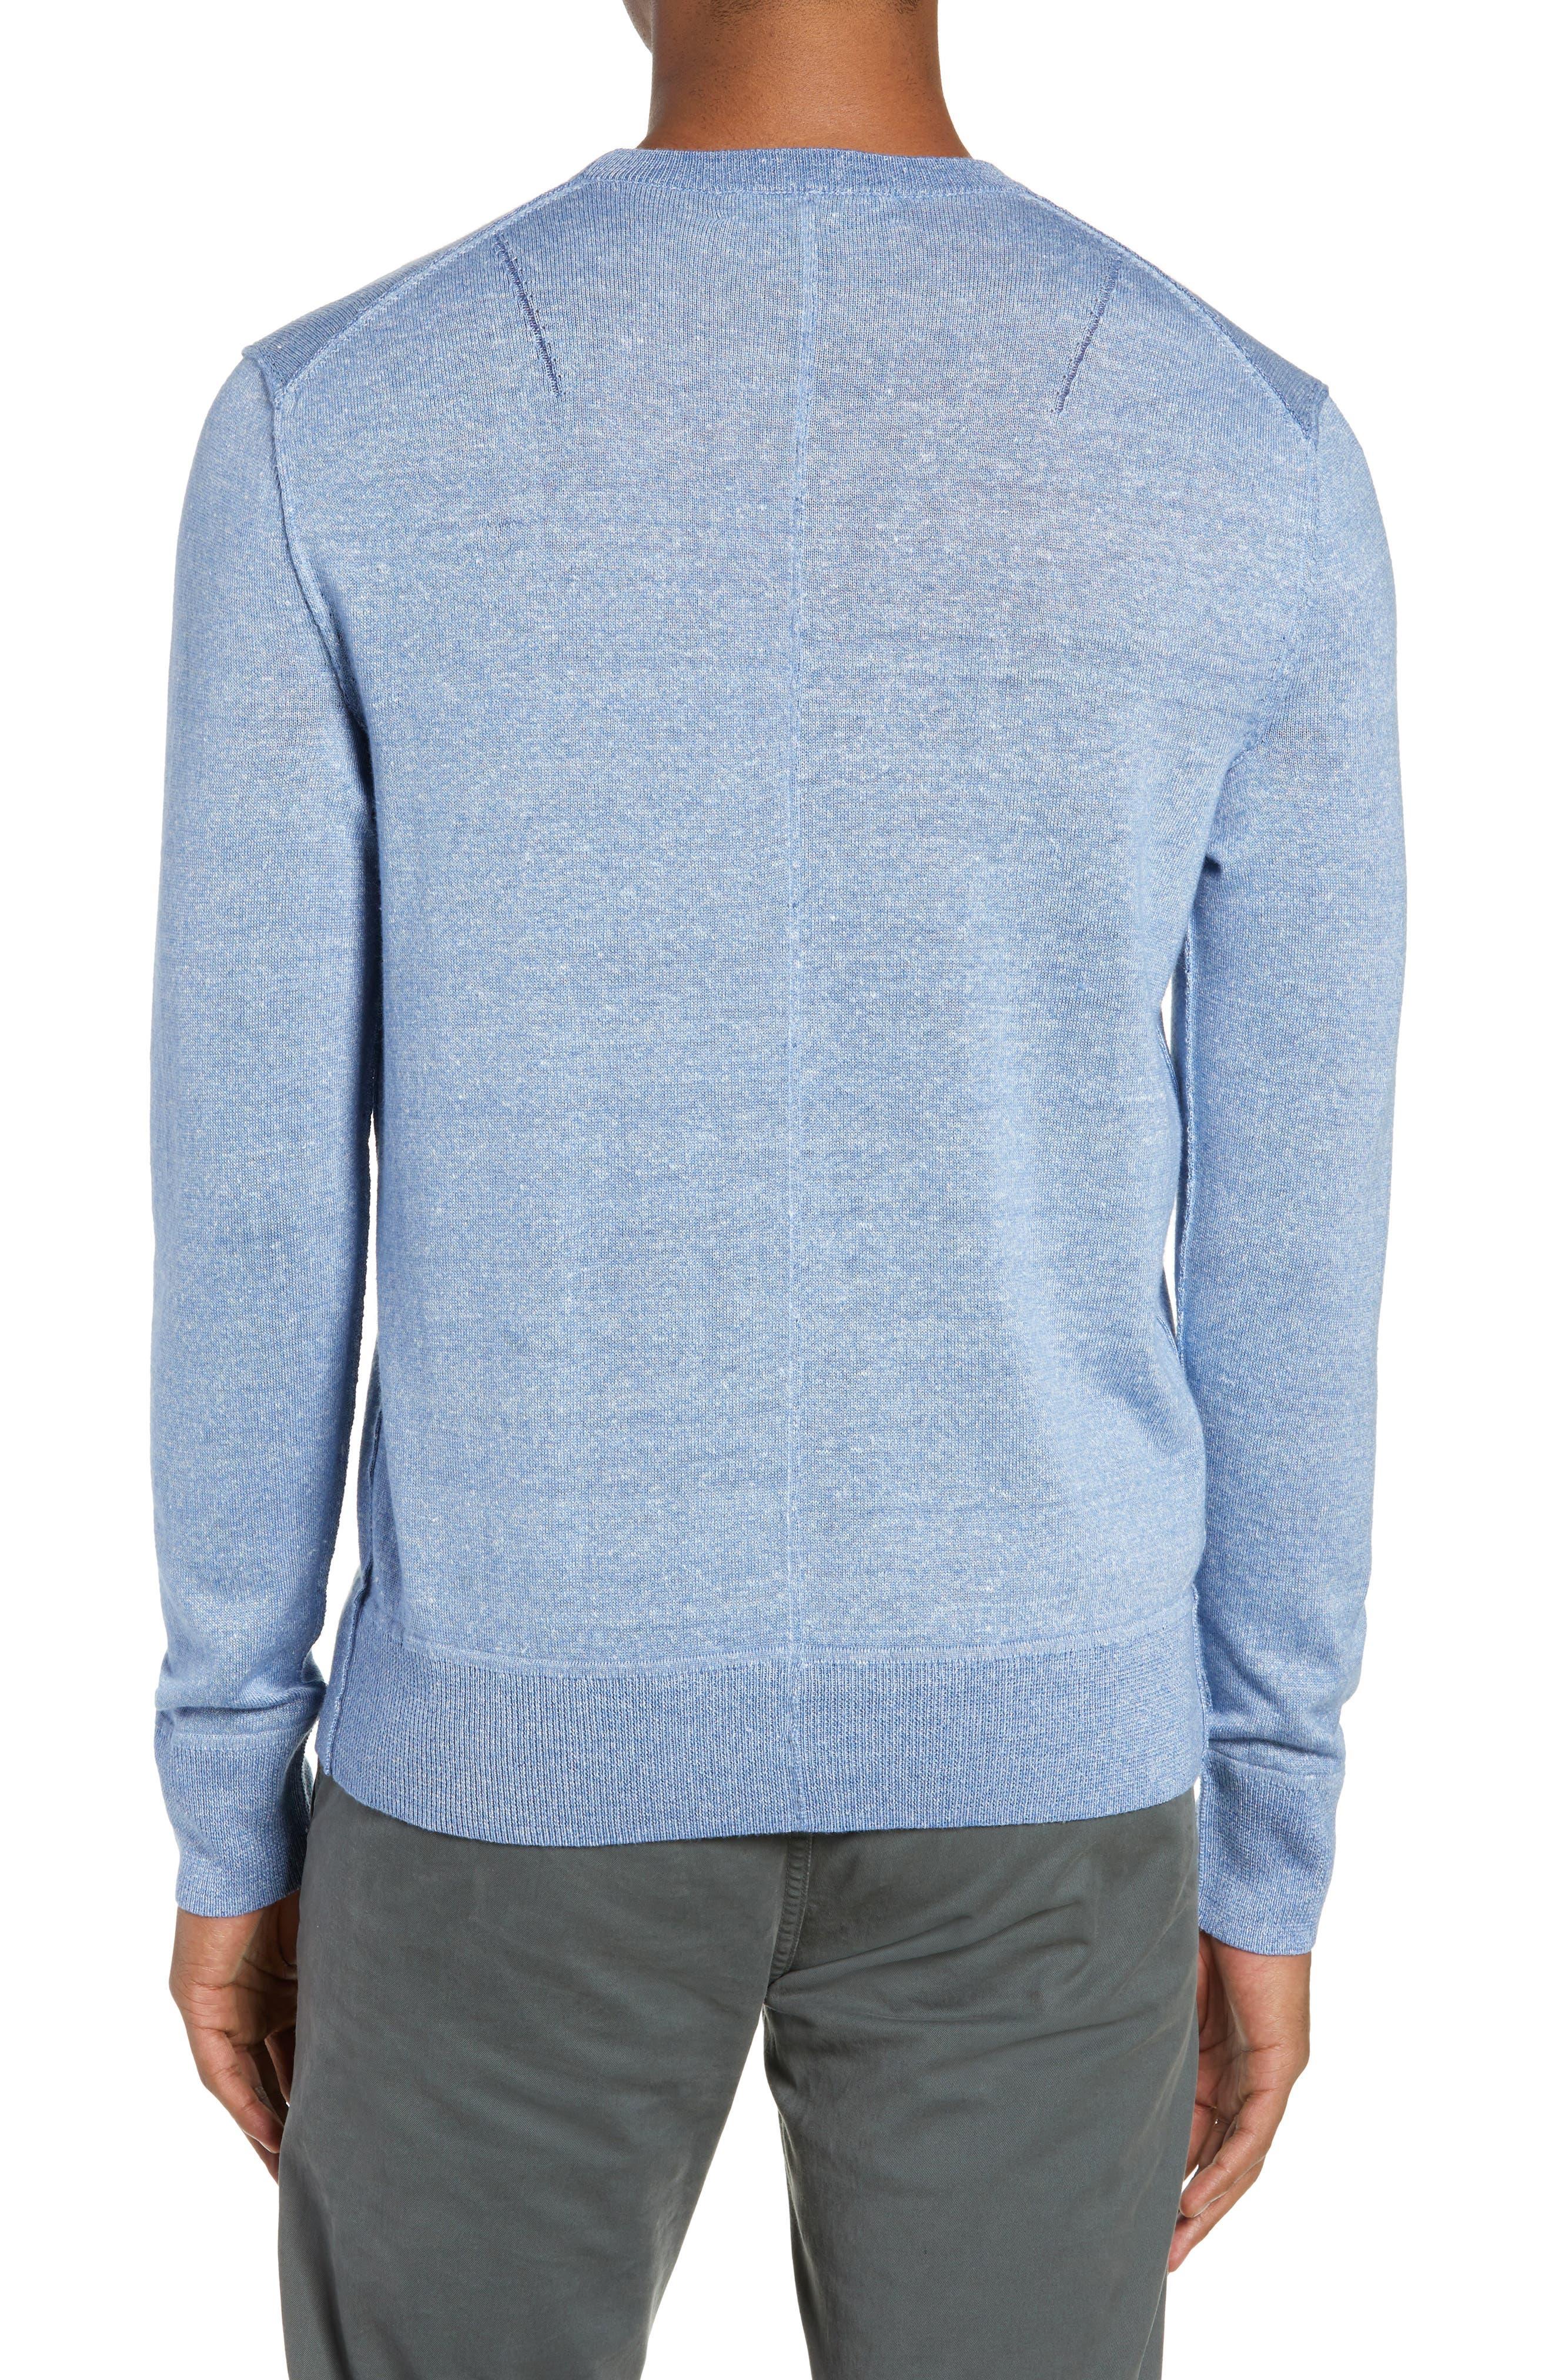 RAG & BONE, Dean Slim Fit Crewneck Sweater, Alternate thumbnail 2, color, 455